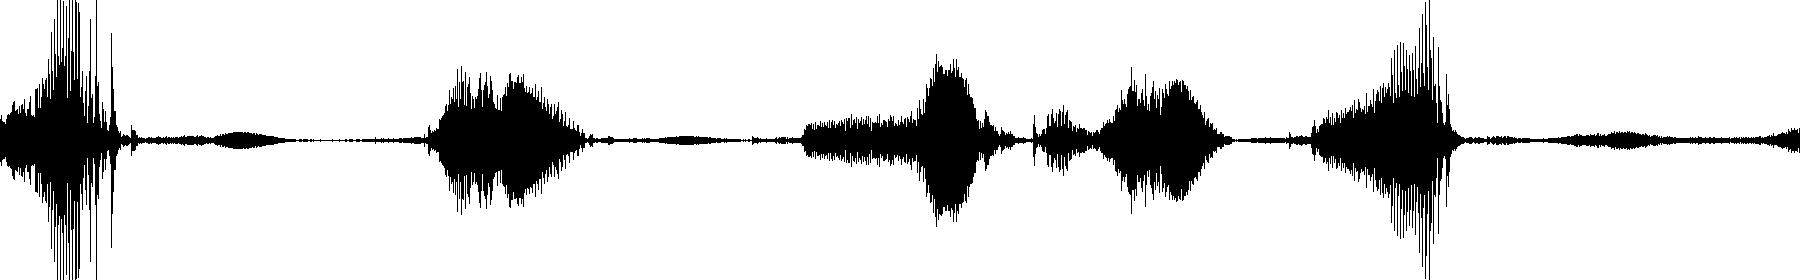 short beatbox echo